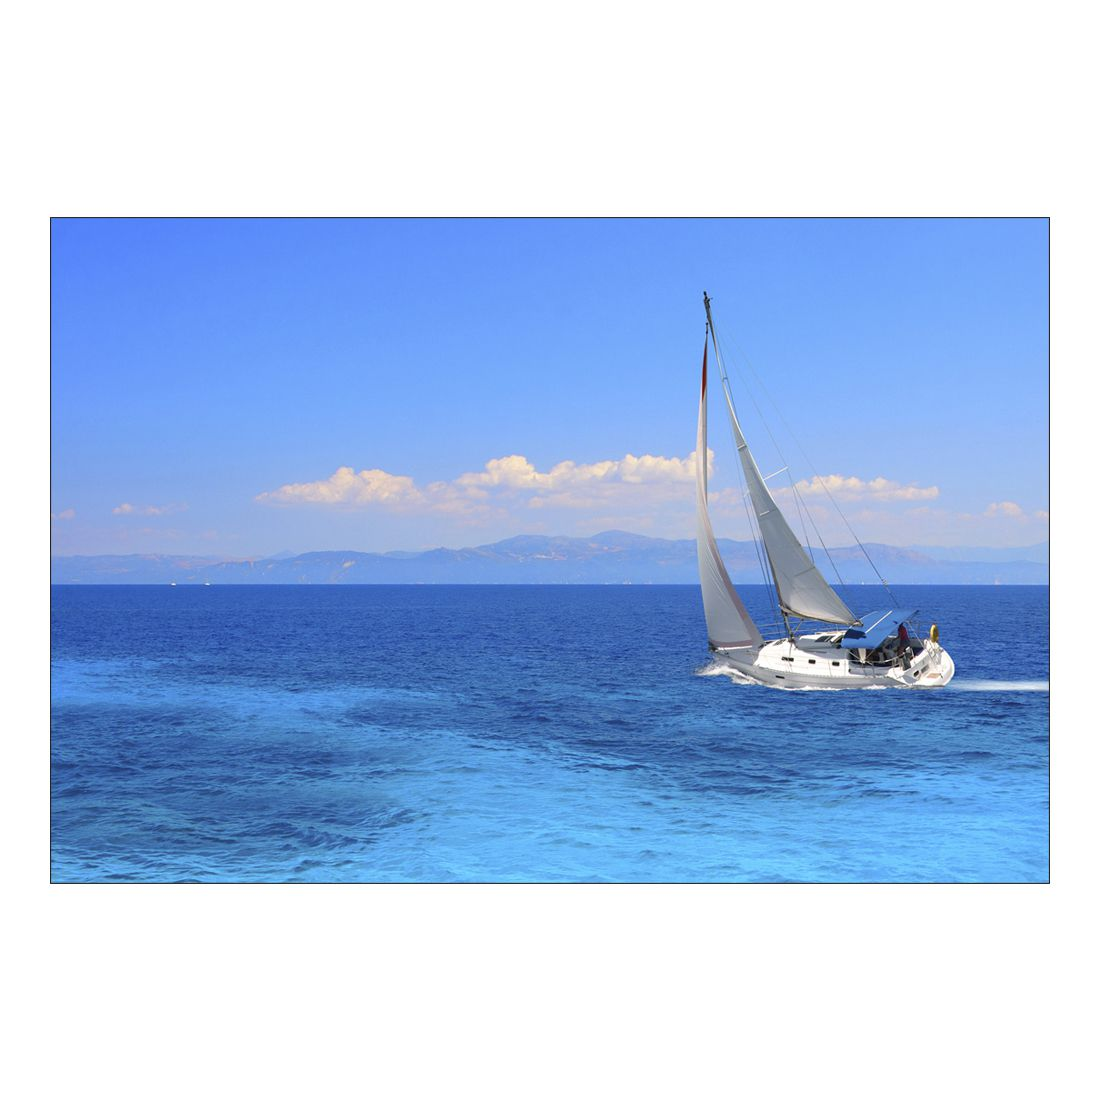 Acrylglasbild Sailboat – Abmessung 90×60 cm, Gallery of Innovative Art jetzt kaufen